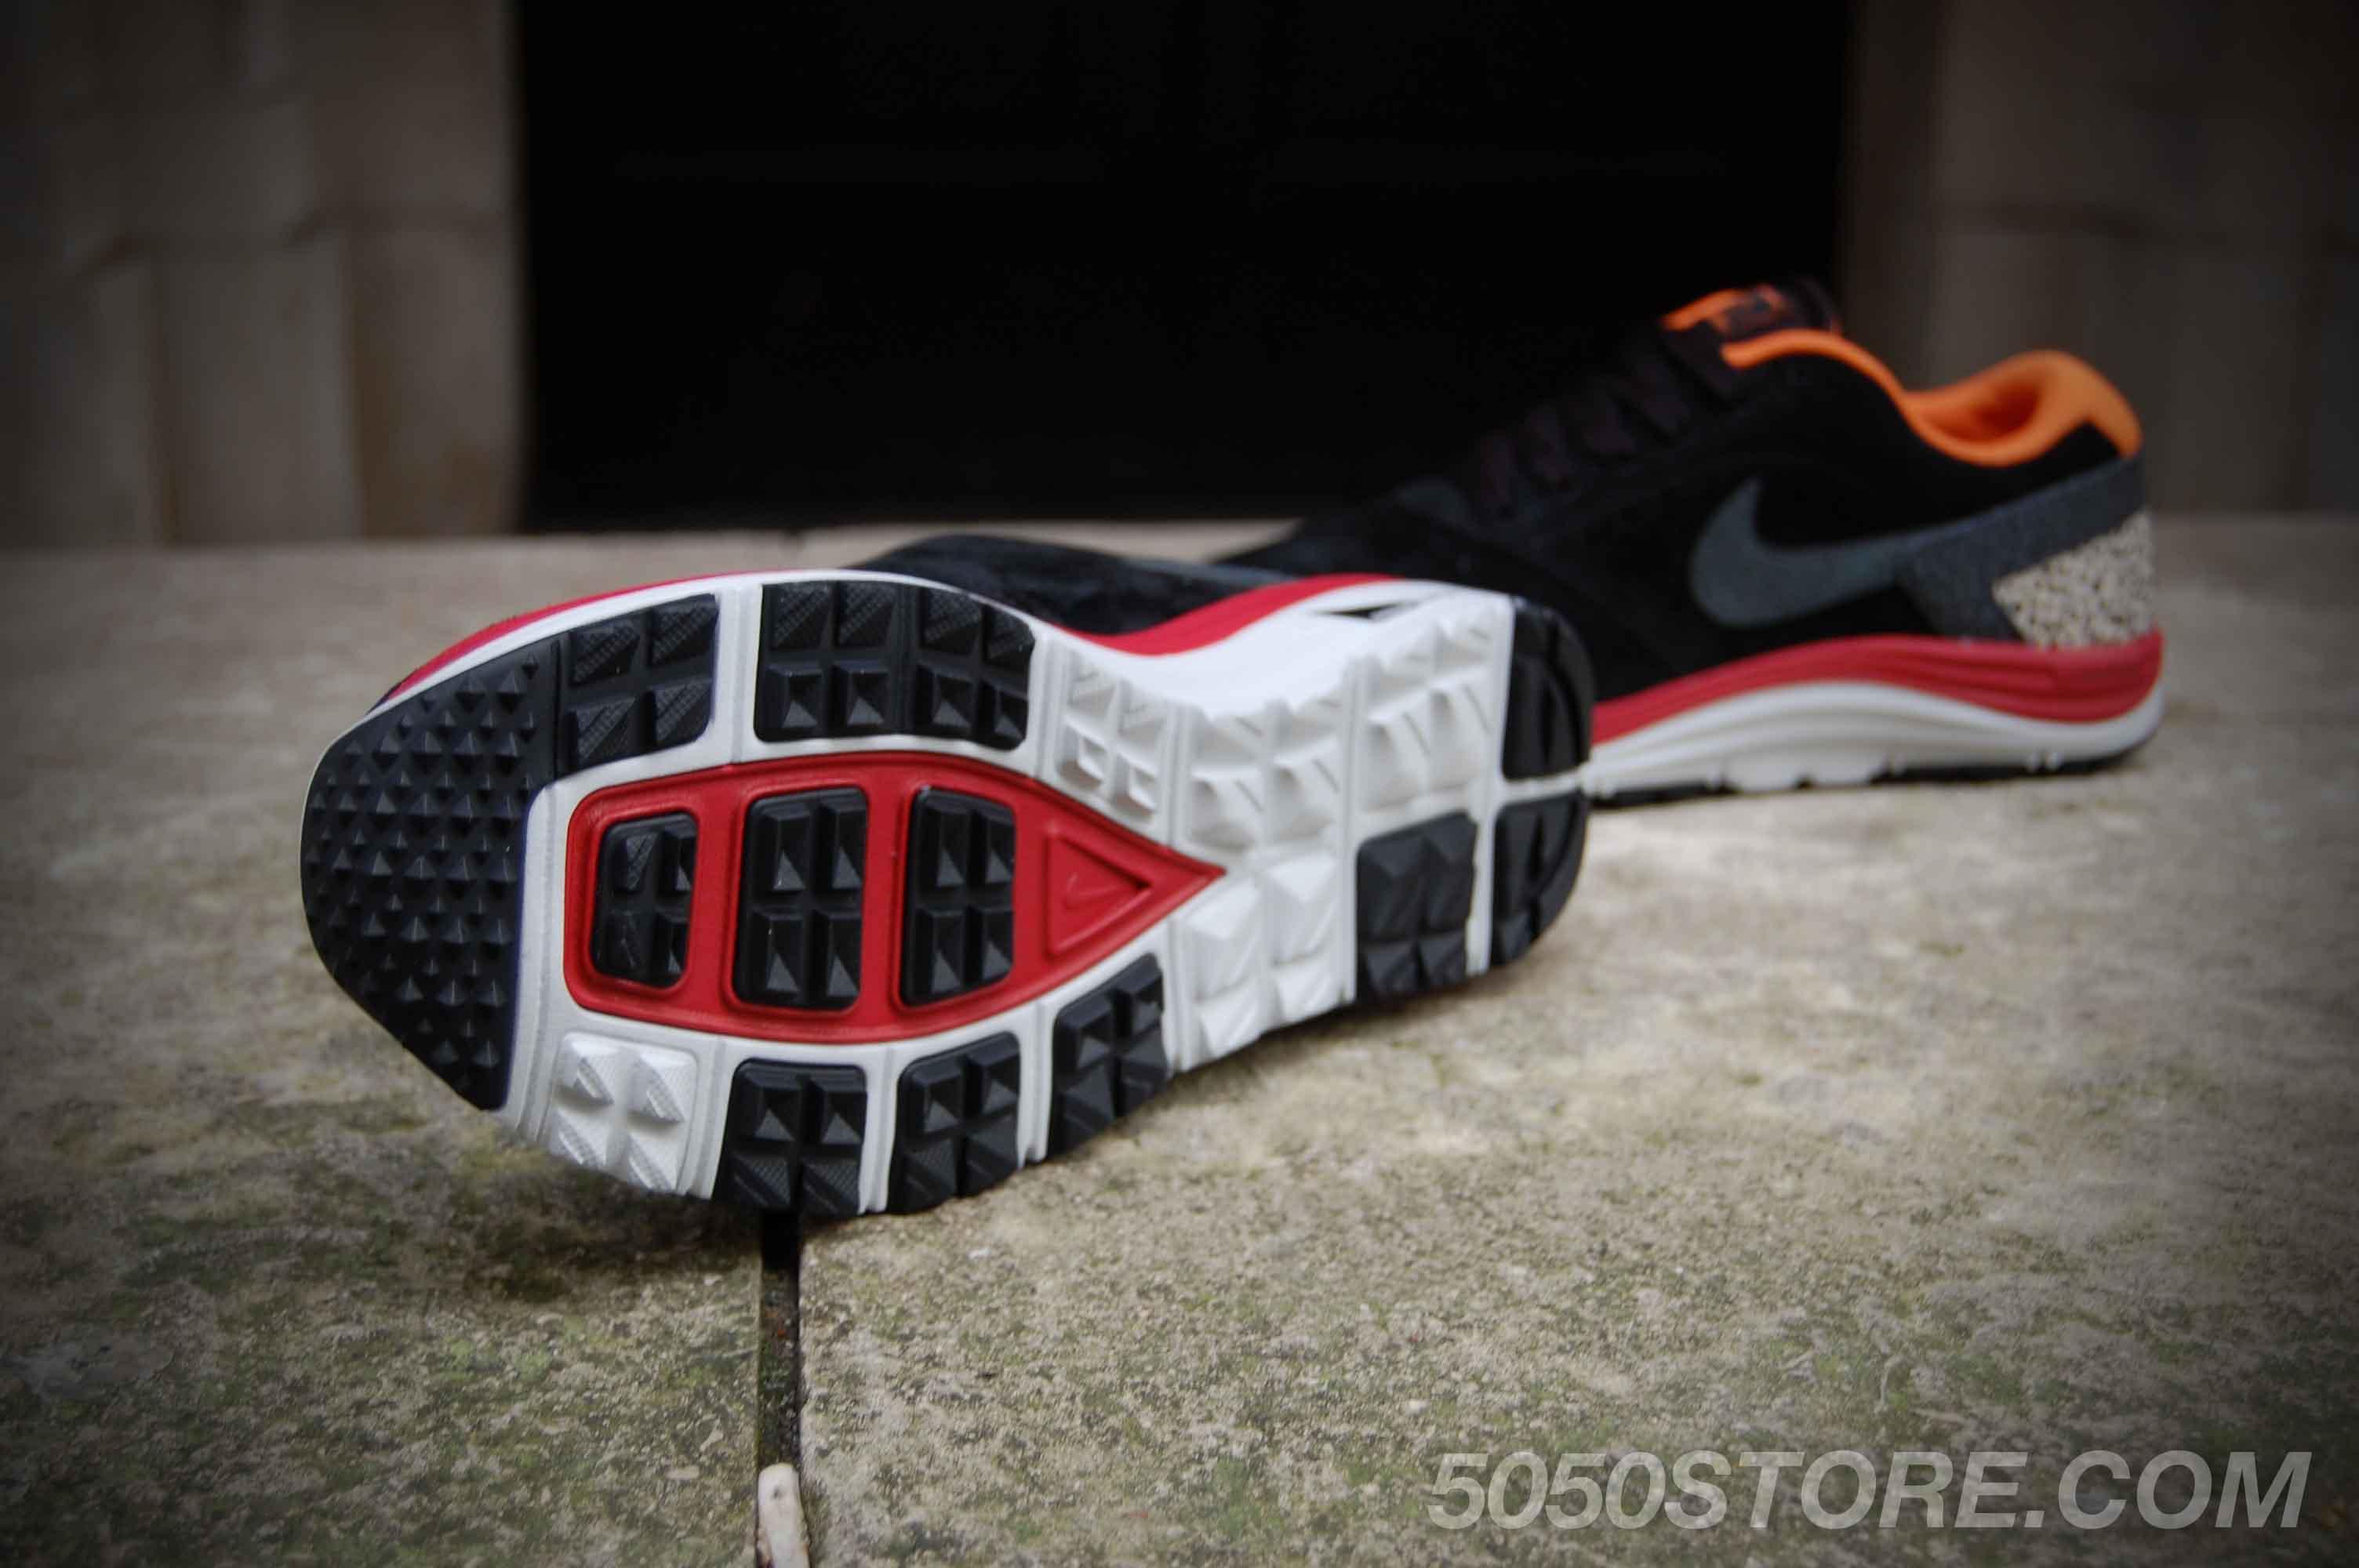 082ba125575c Primitive x Nike SB Lunar Rod  Safari  - Detailed Look